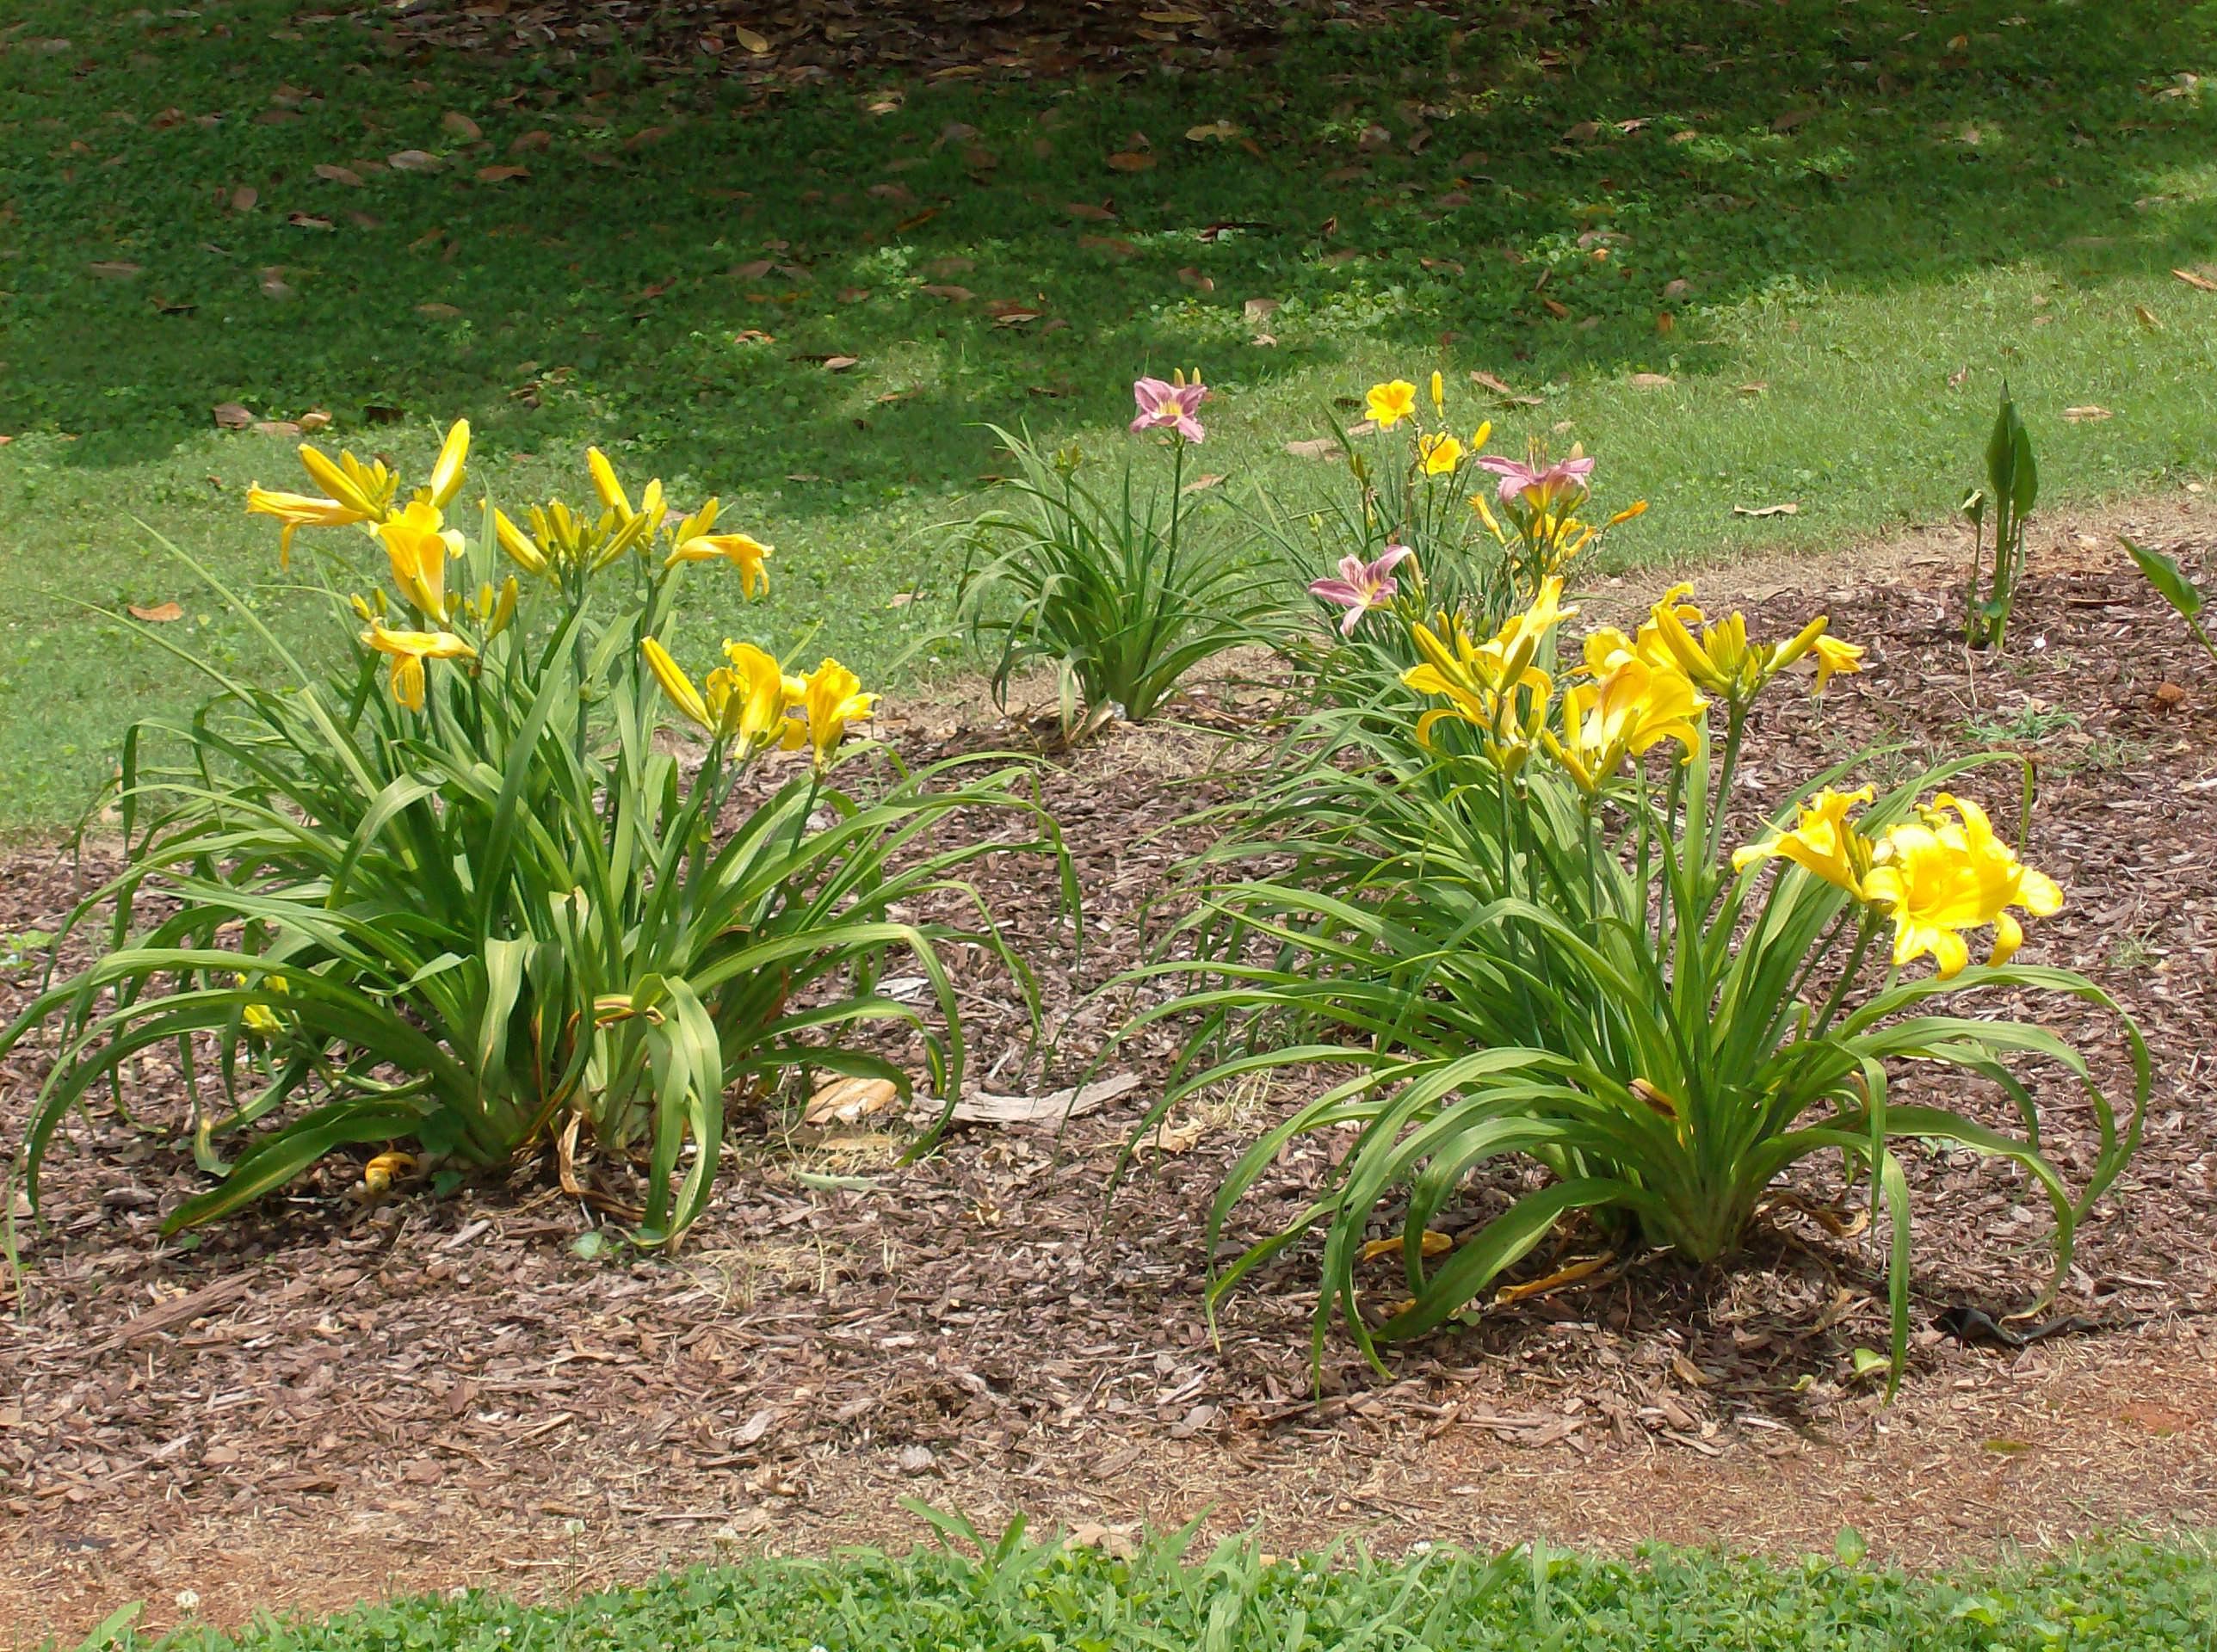 Yellow Tiger Lillies by FearOfTheBlackWolf